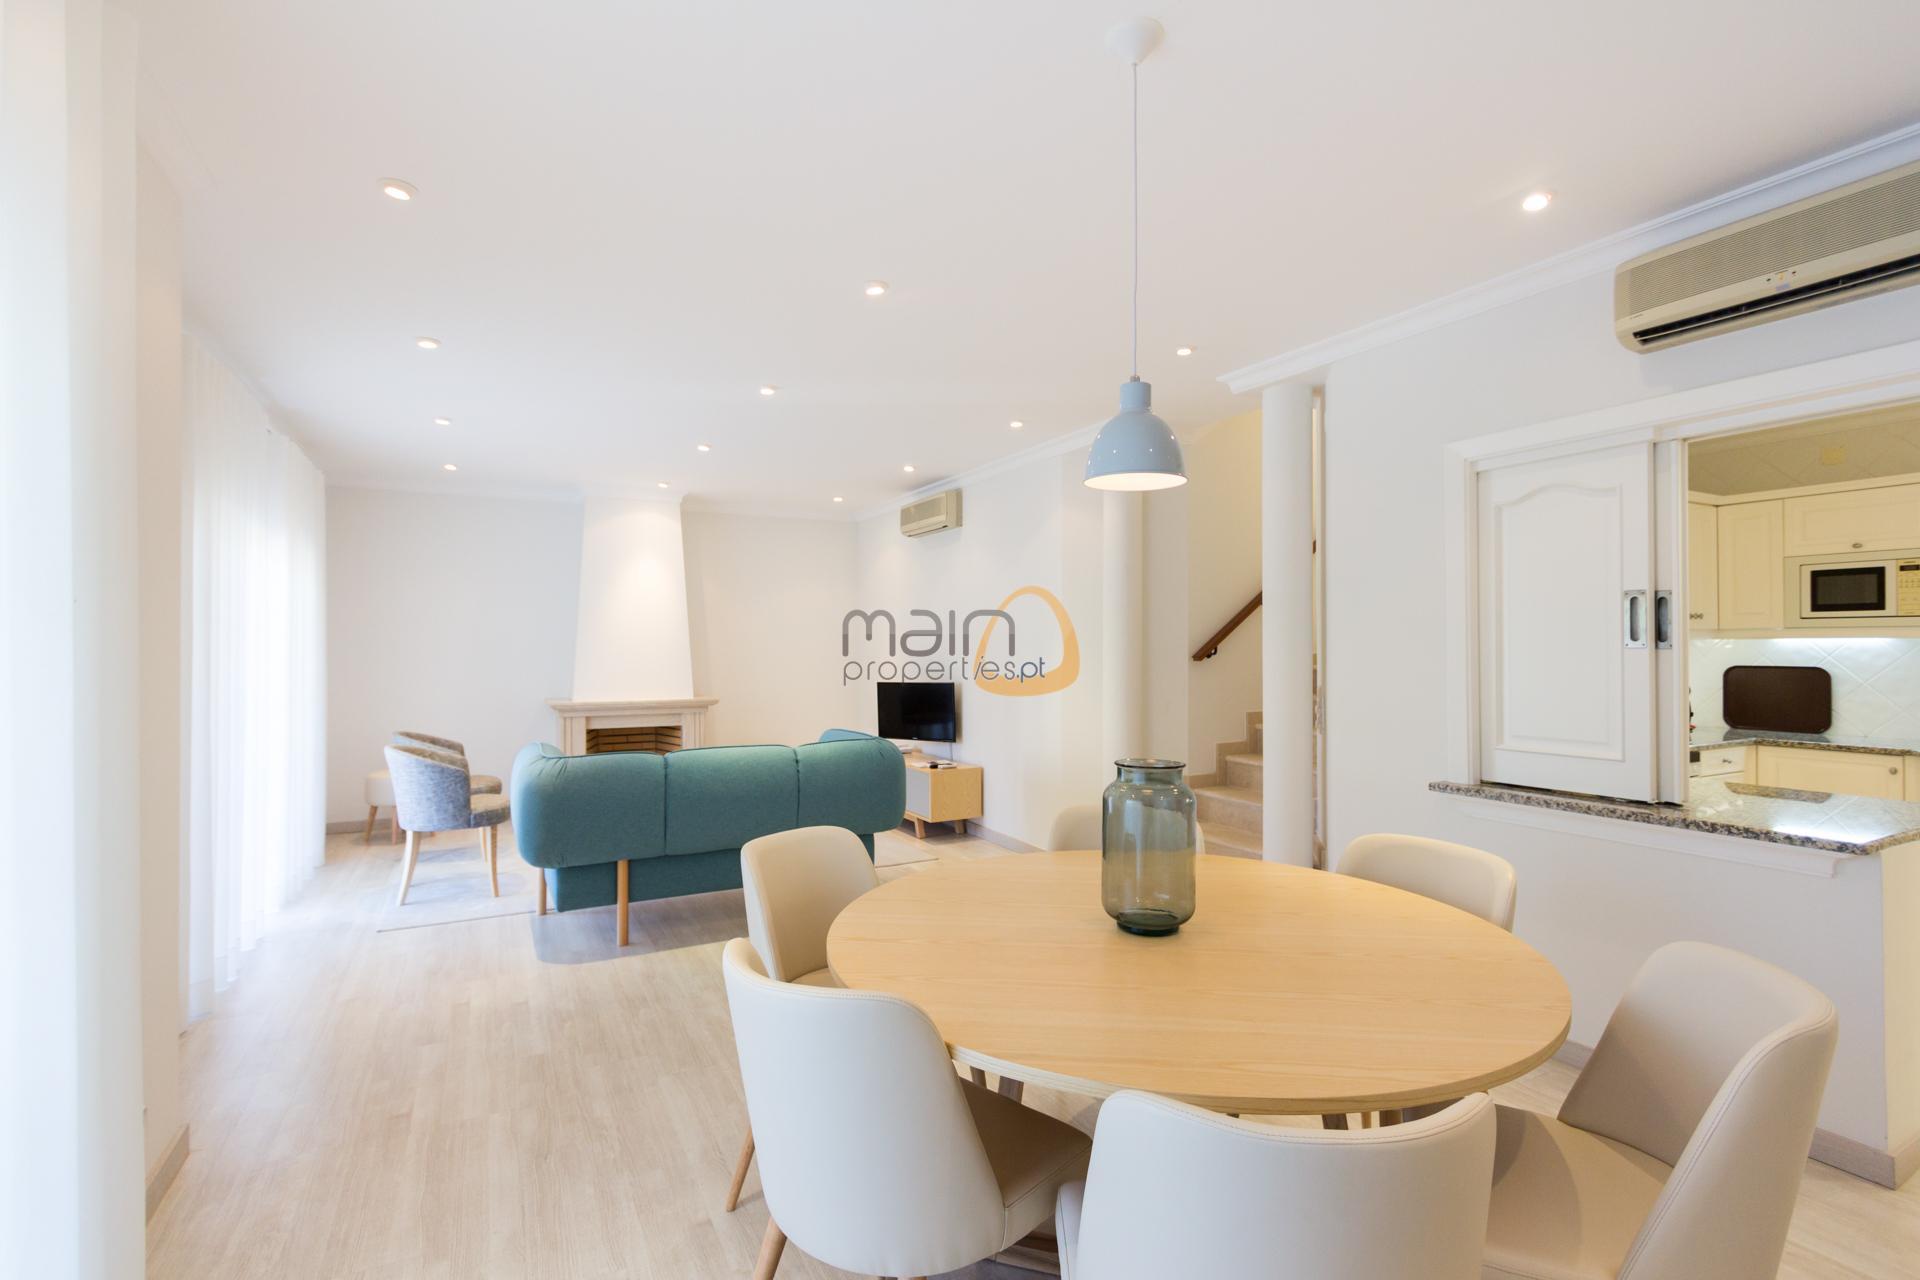 apartment-in-vale-do-lobo-algarve-golden-triangle-portugal-property-real-estate-mainproperties-mp134vdl-3